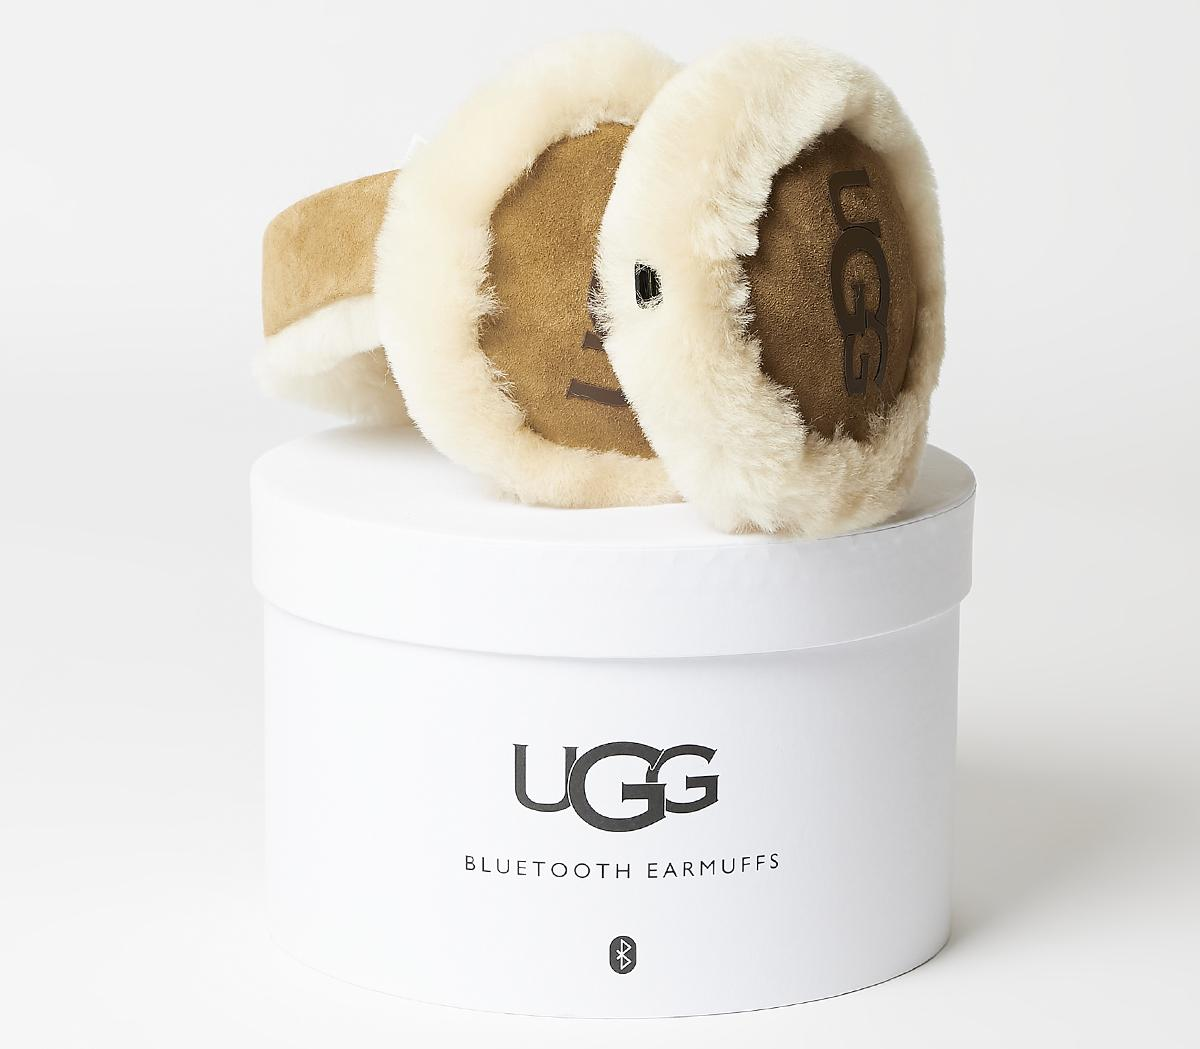 Ugg Logo Bluetooth Earmuffs